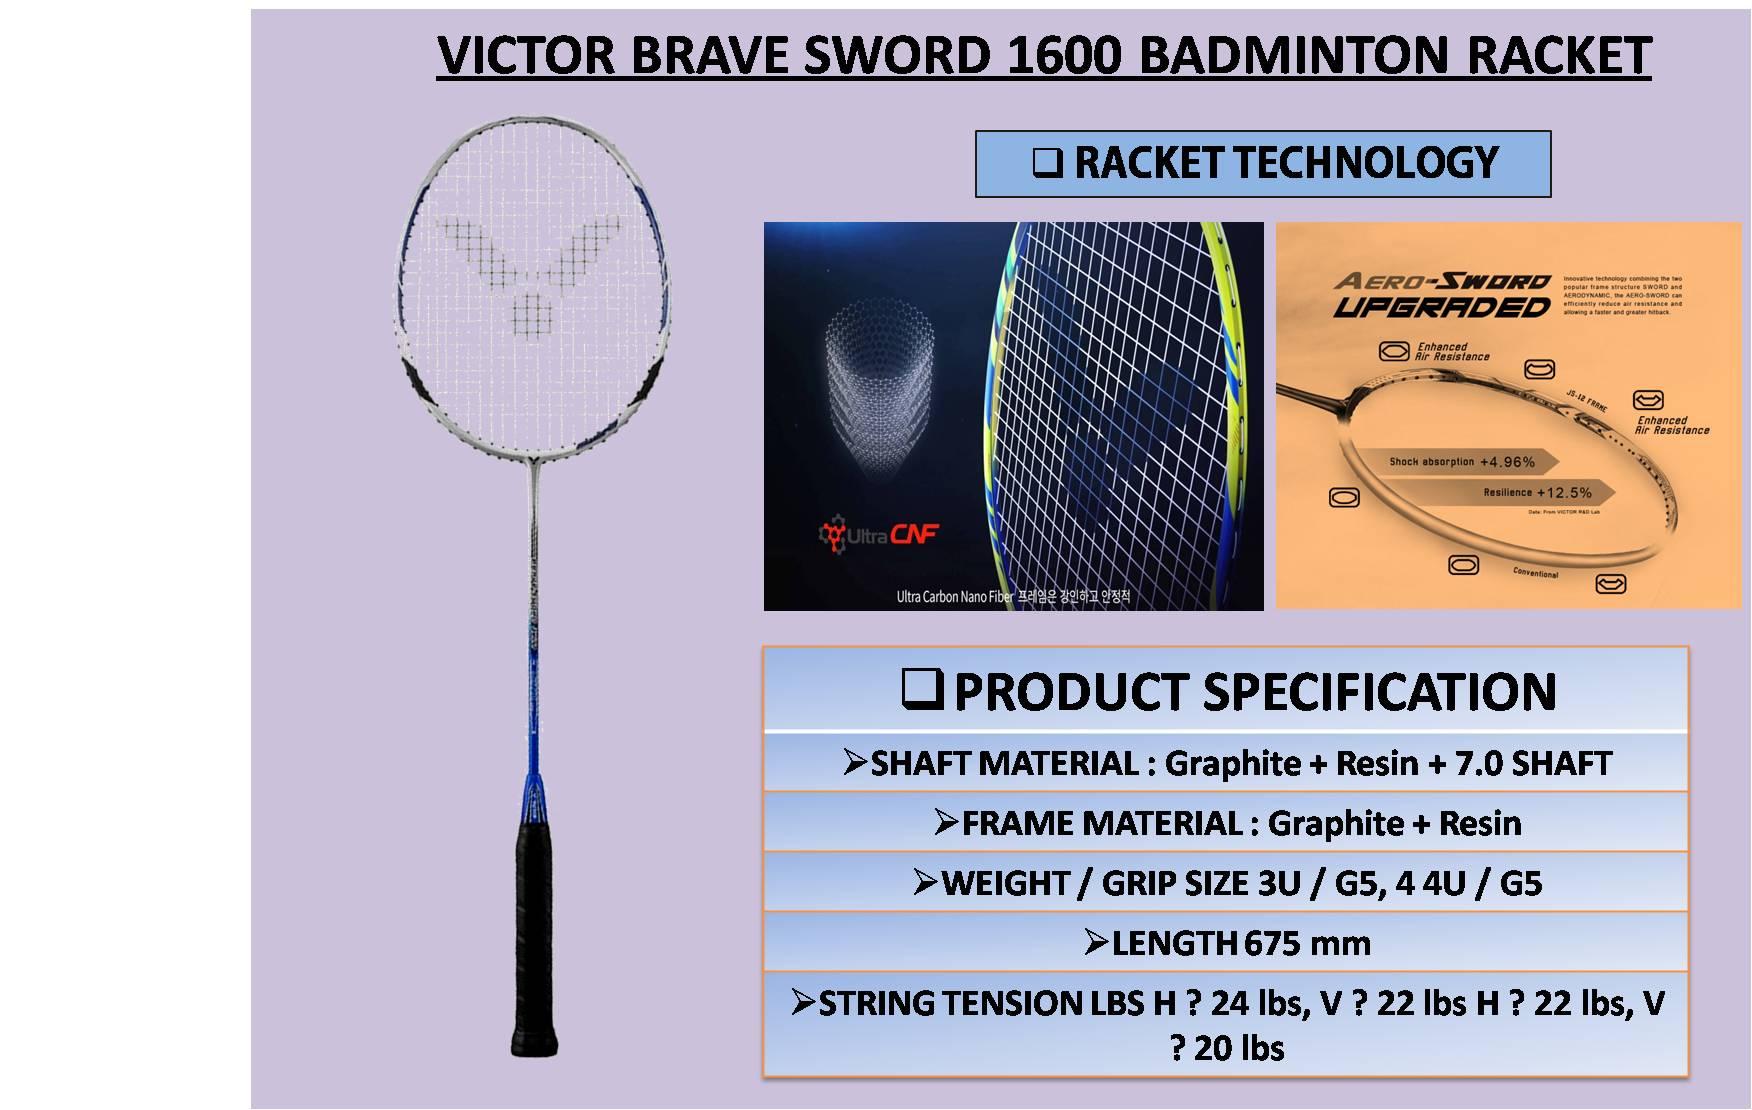 VICTOR BRAVE SWORD 1600 BADMINTON RACKET